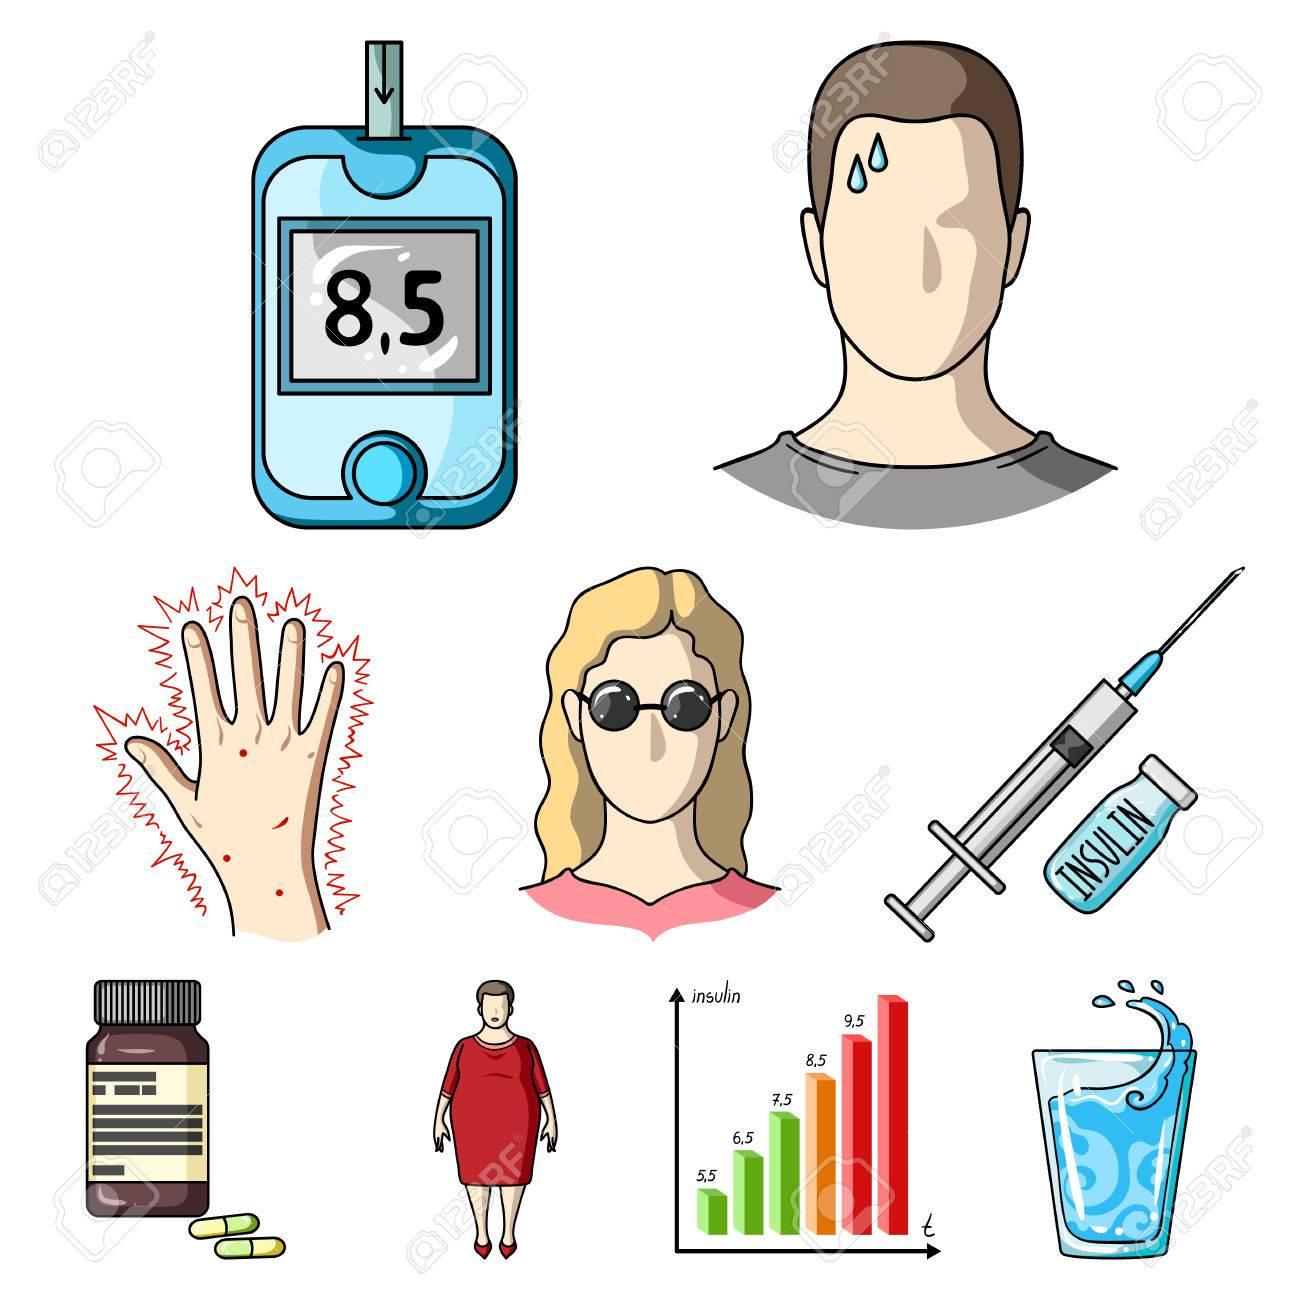 acerca de la diabetes mellitus